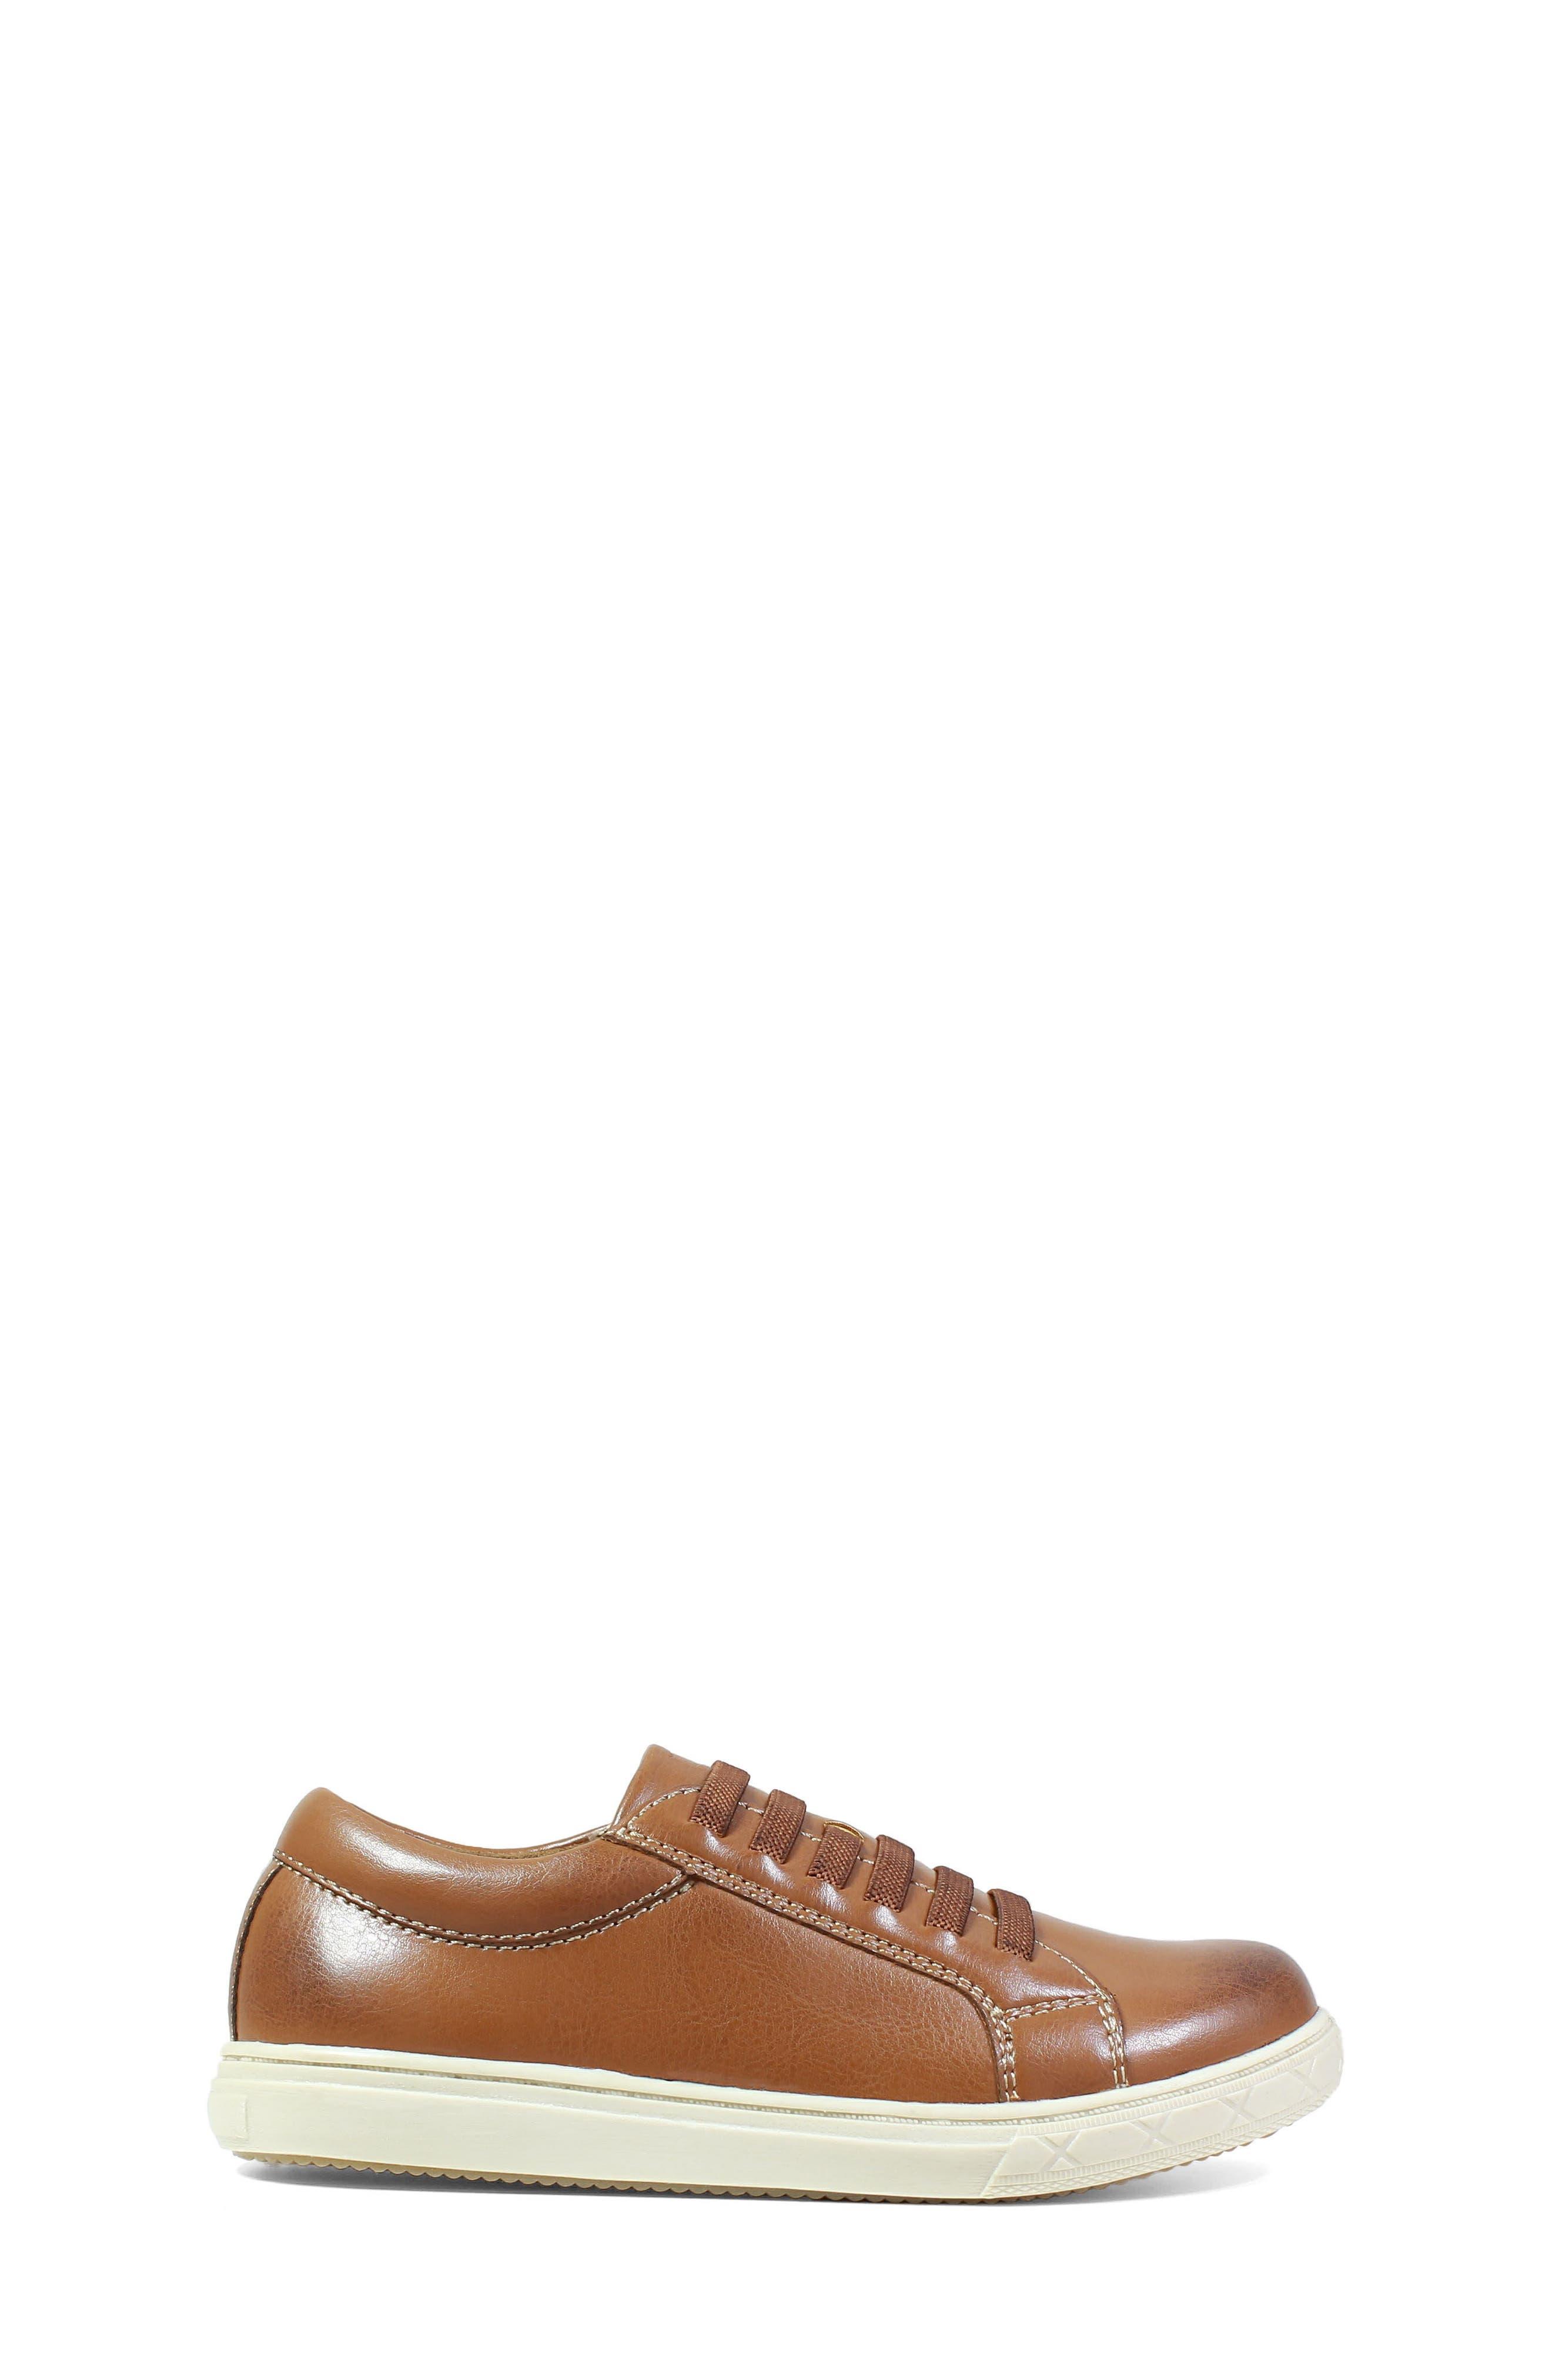 Curb Elastic Lace Sneaker,                             Alternate thumbnail 3, color,                             Cognac